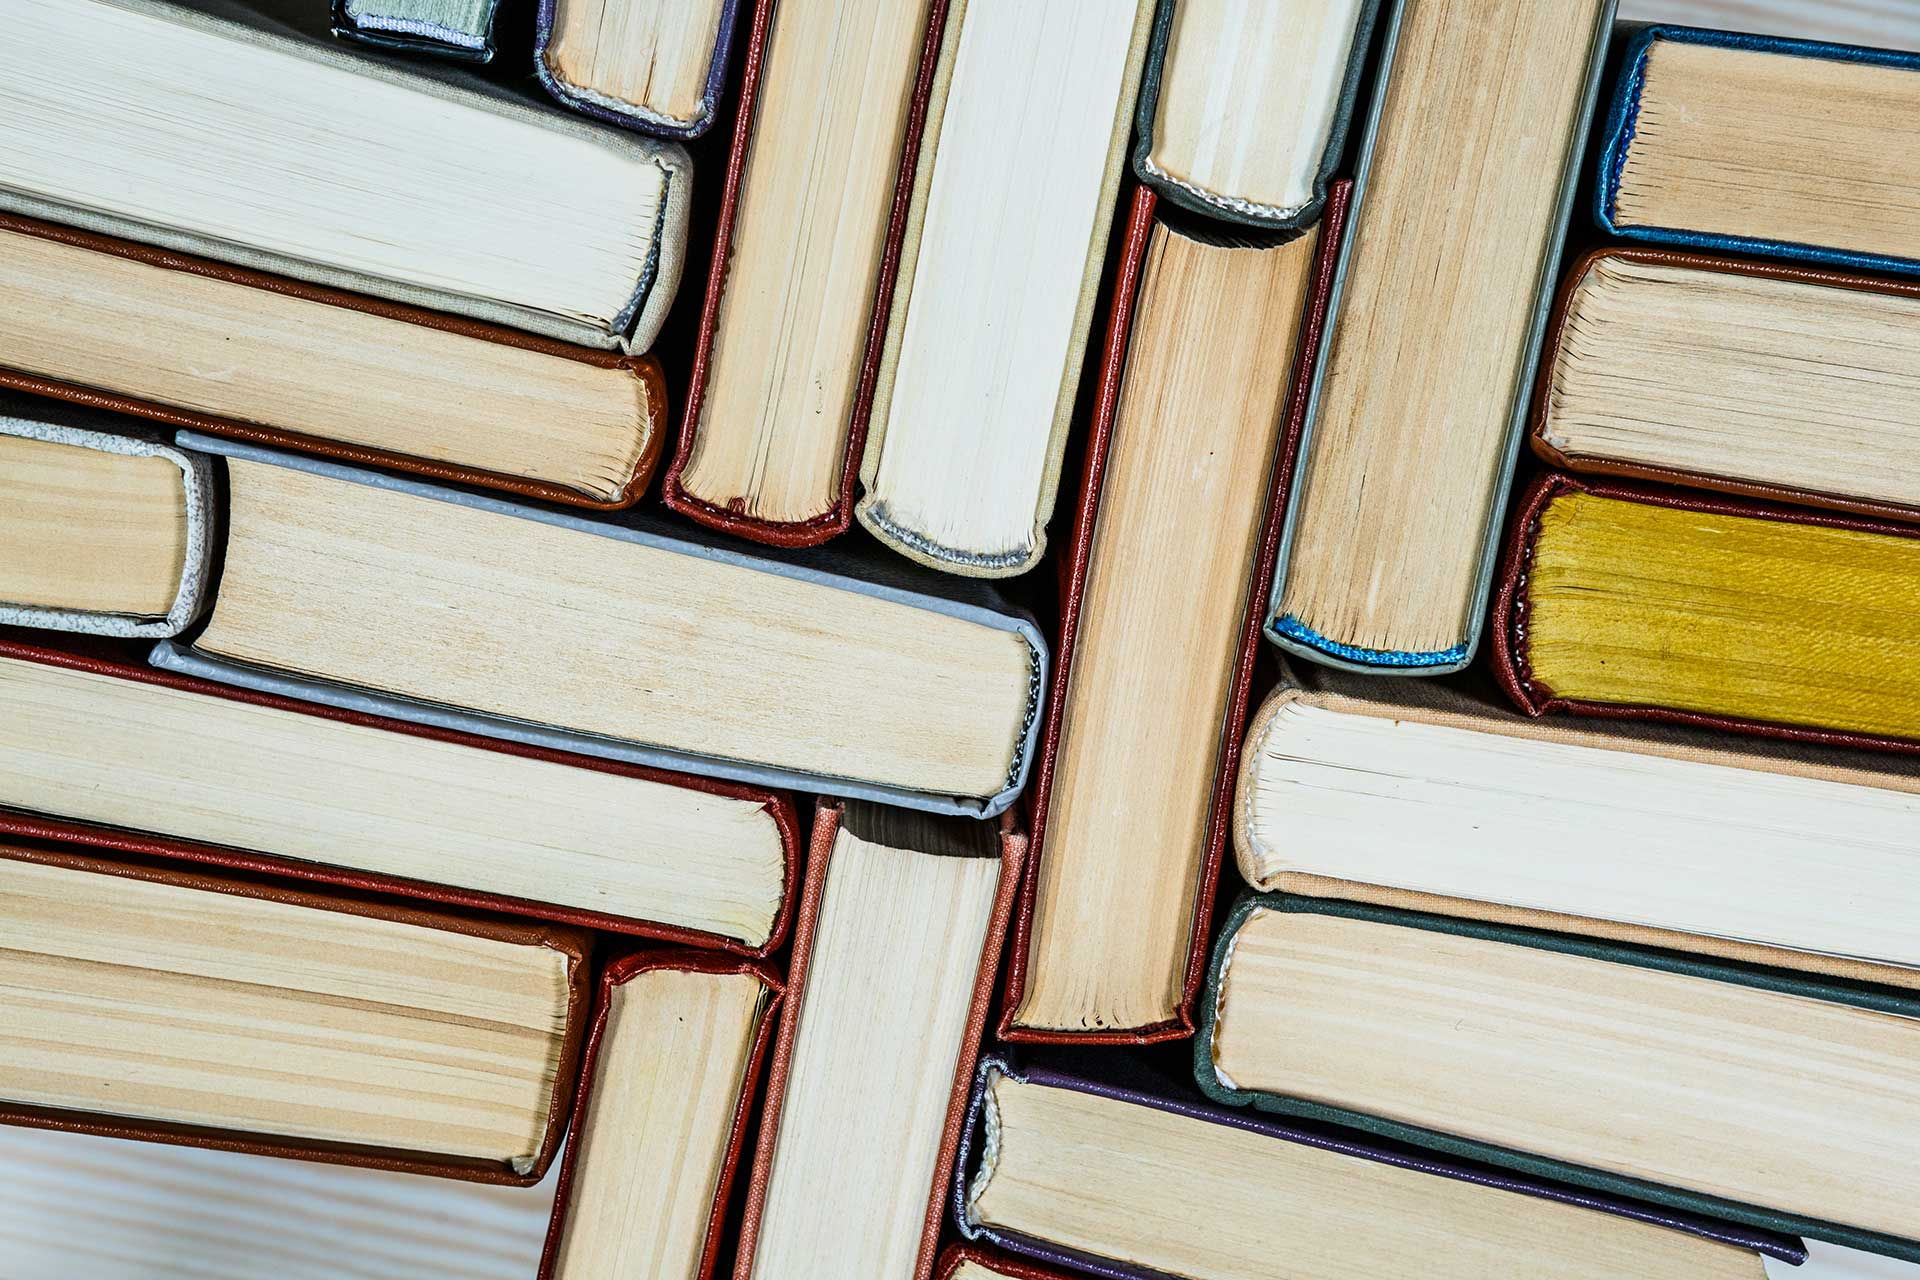 Image representing Comparative Literature and English and American Literature